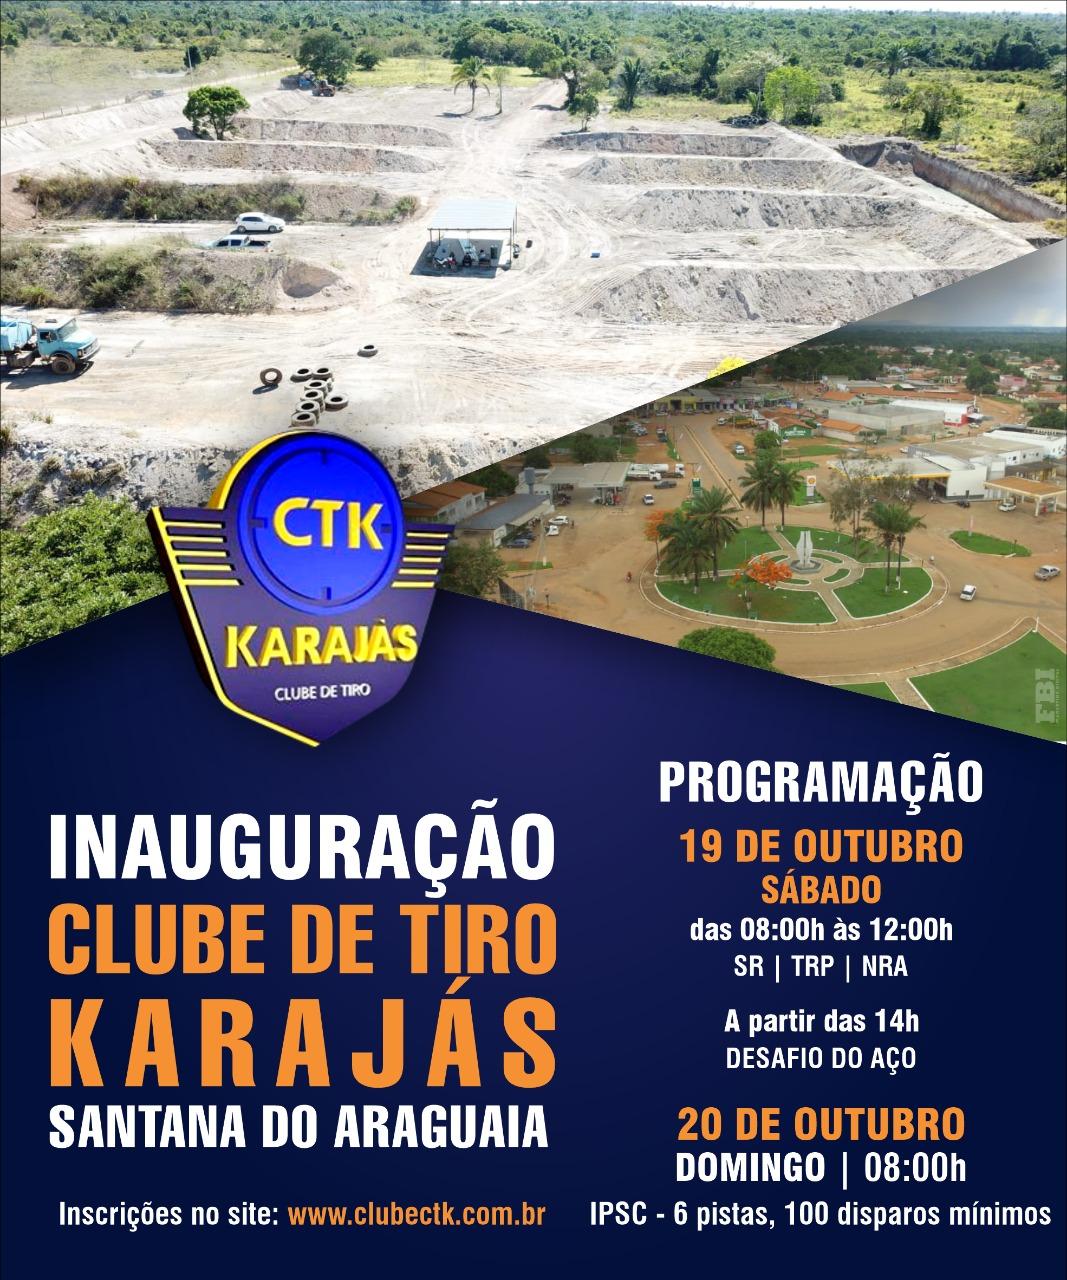 inauguraao-santana_5d994a73ca756.jpg